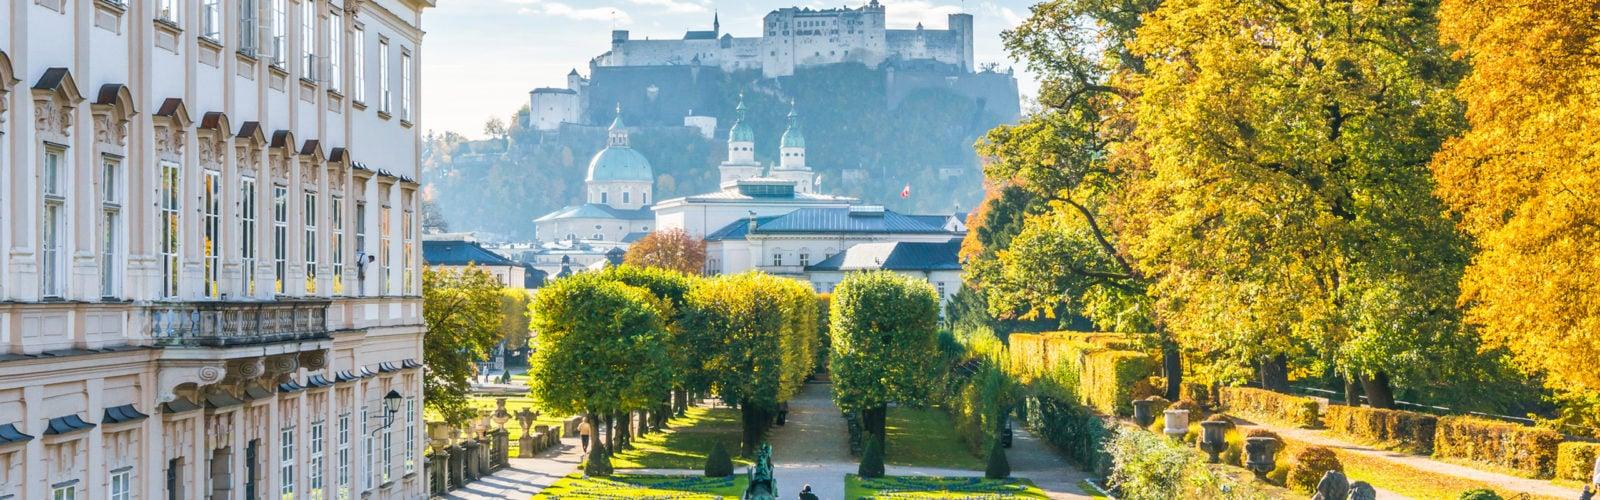 mirabell-palace-and-gardens-salzburg-austria